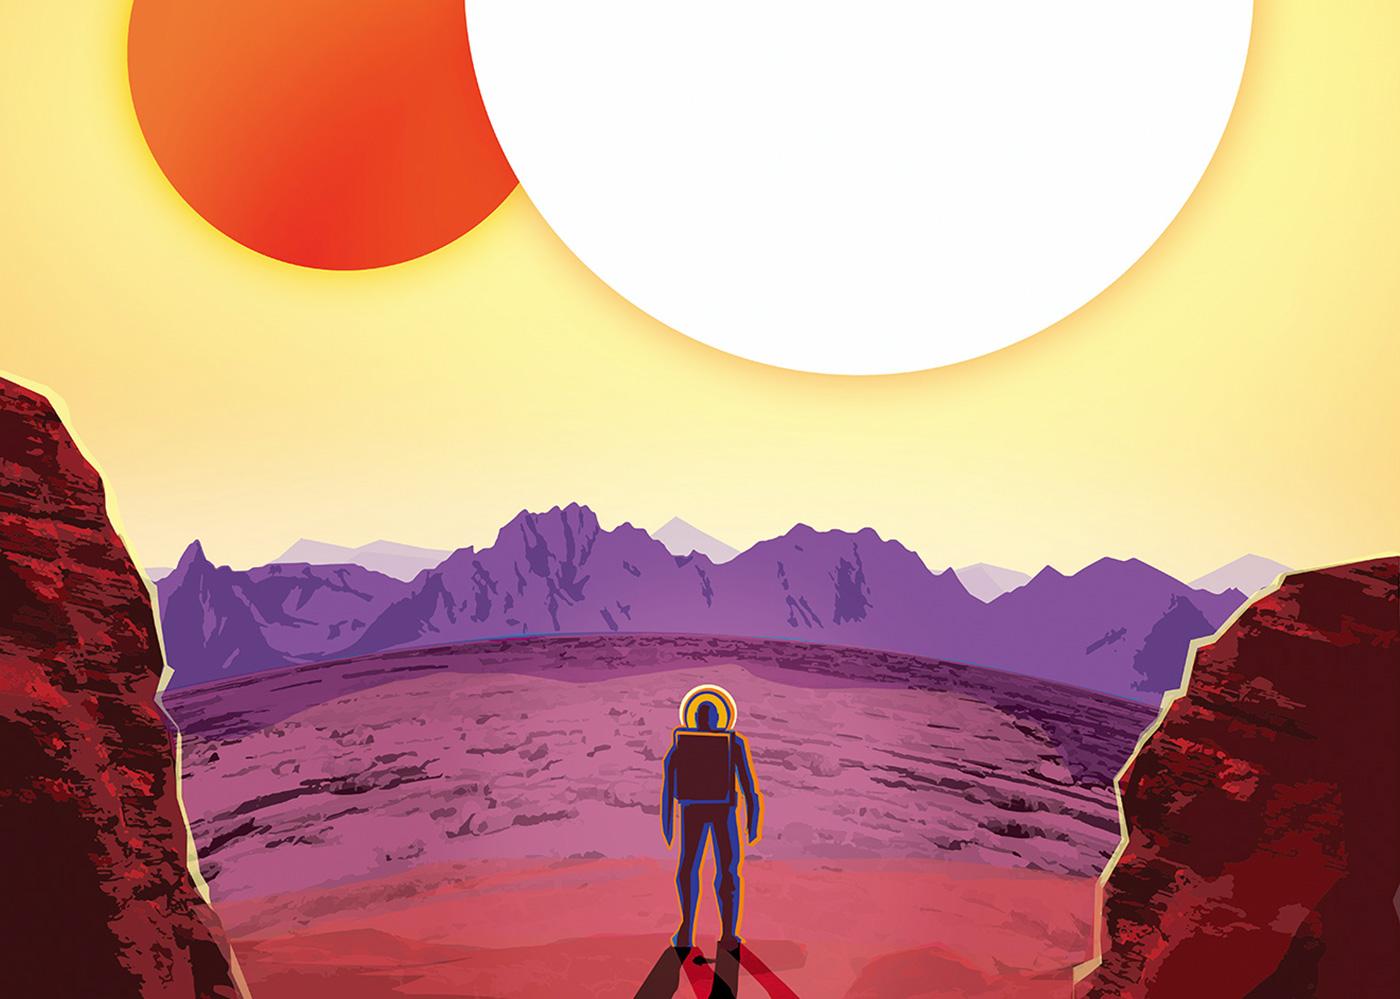 NASA 邀你去系外行星旅行,看血紅色天空和孿生太陽